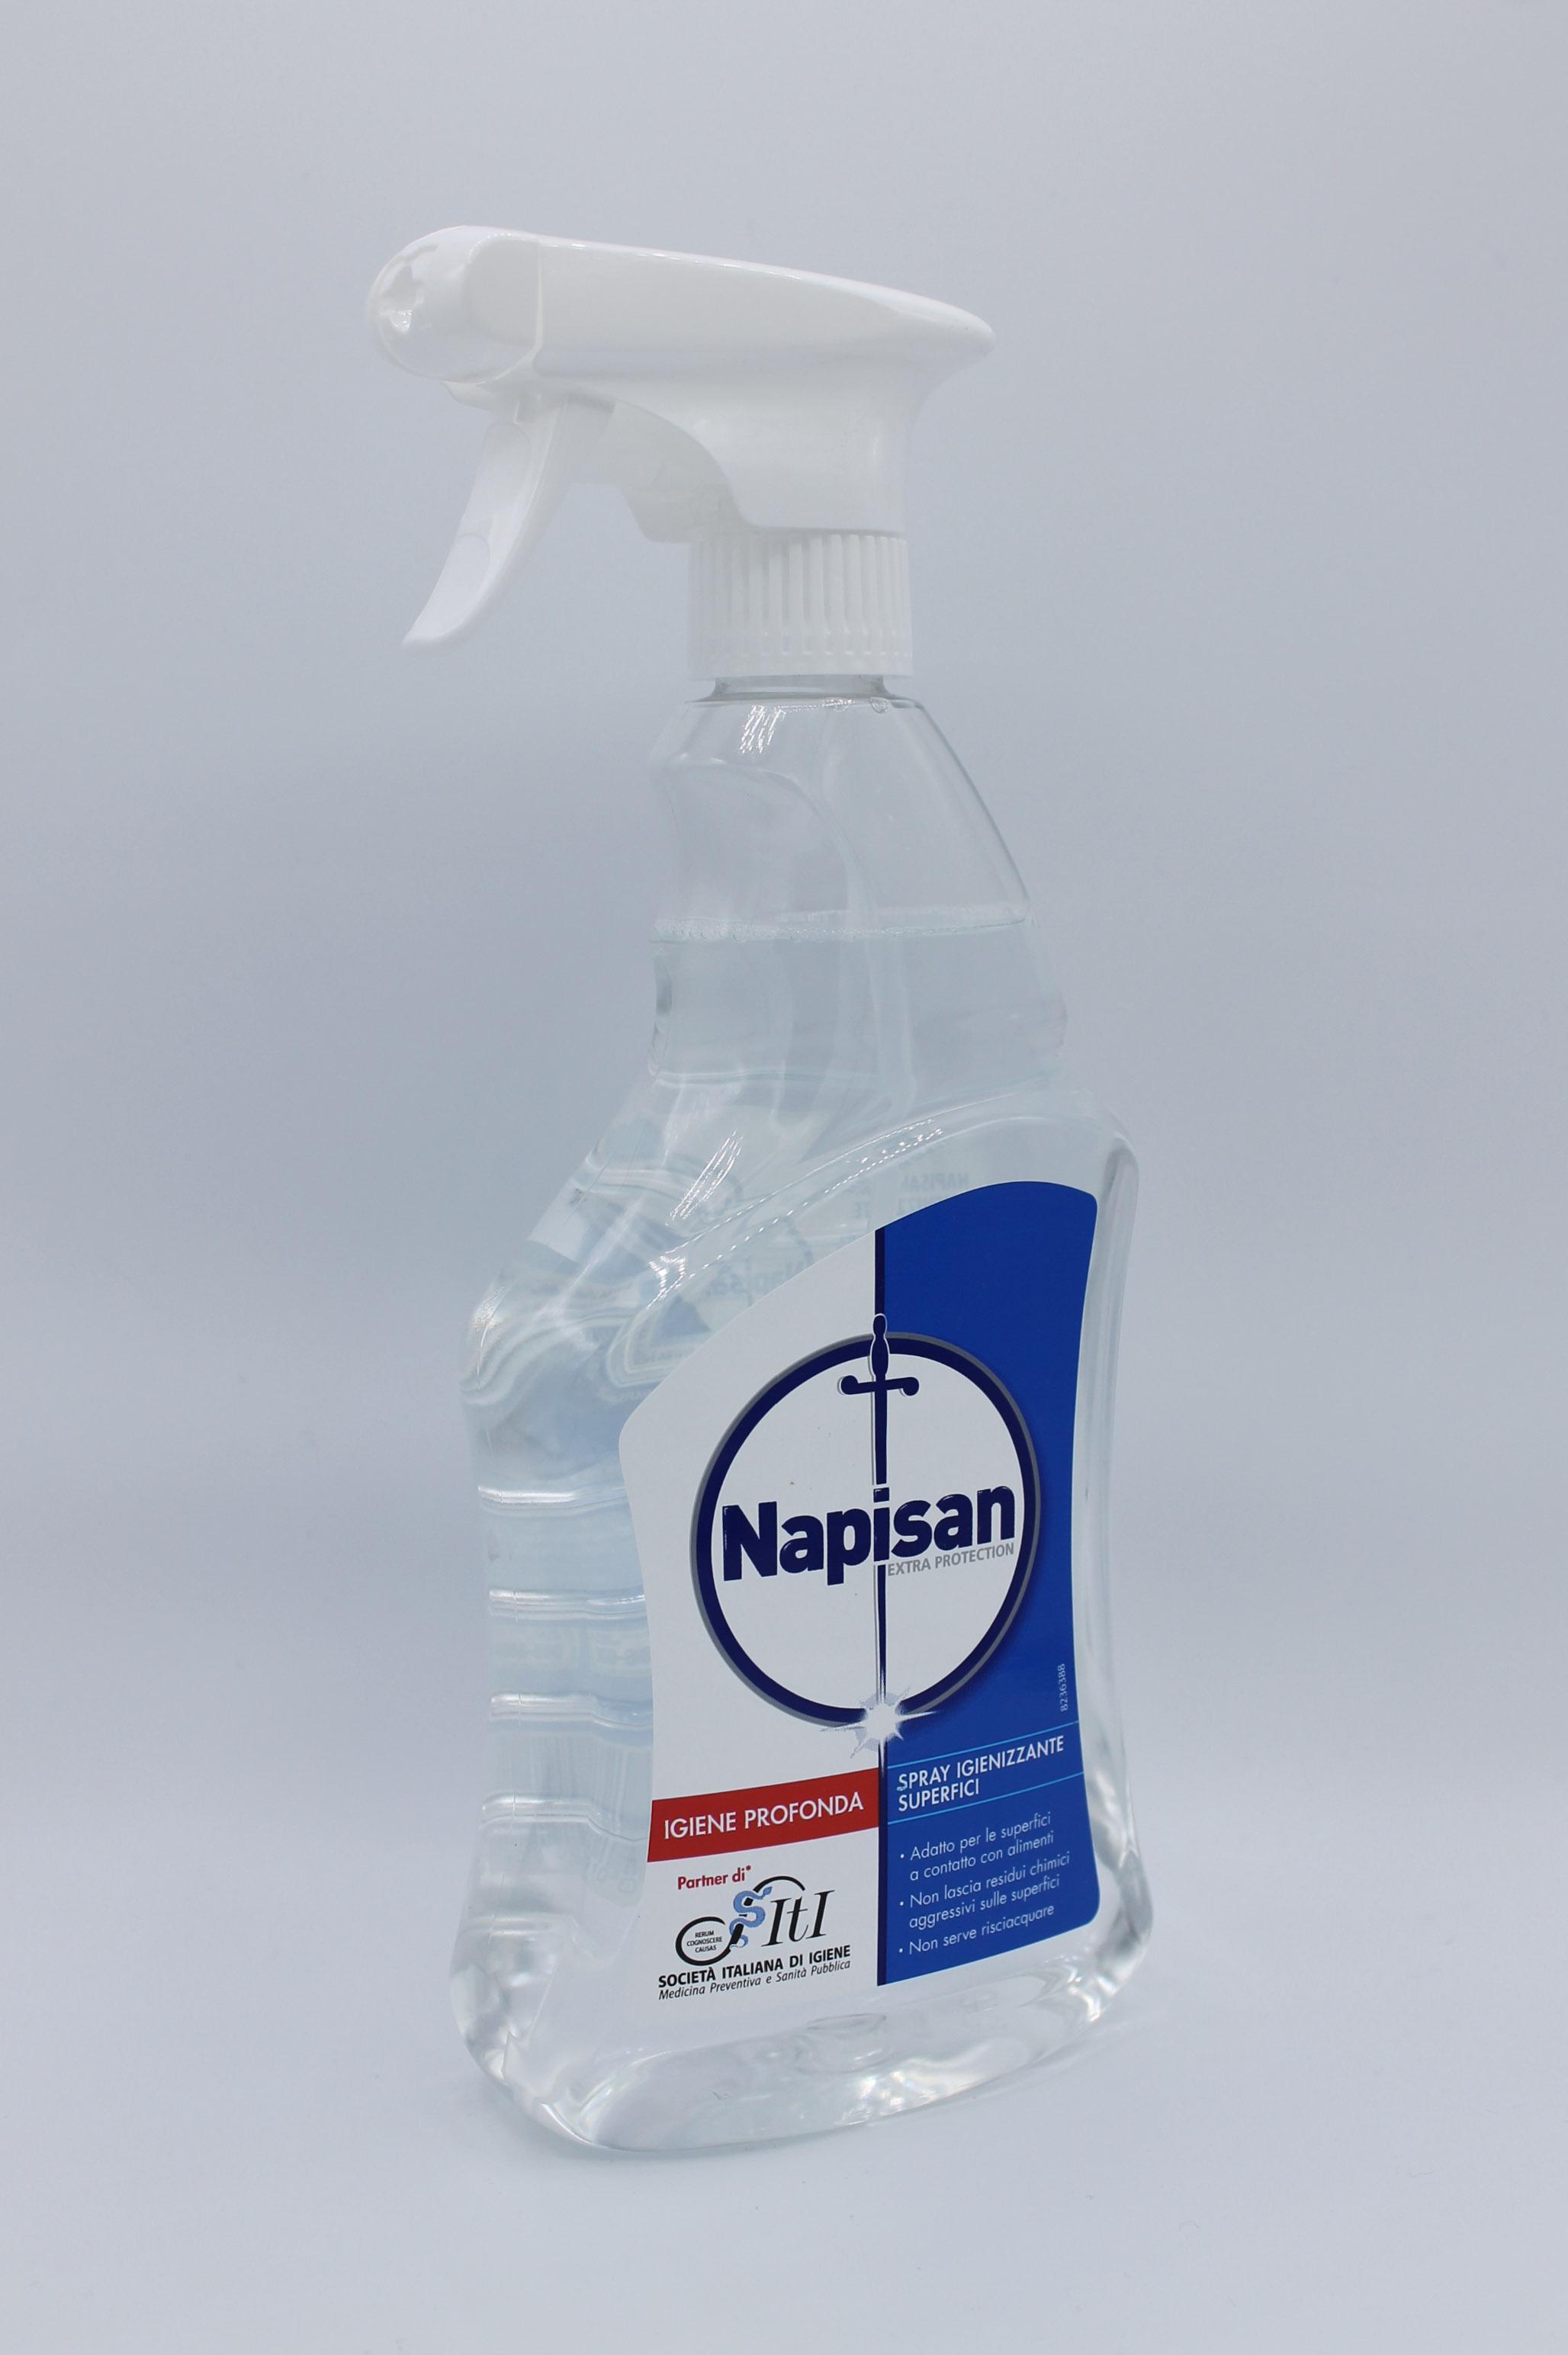 Napisan detergente superfici 750ml varie profumazioni.